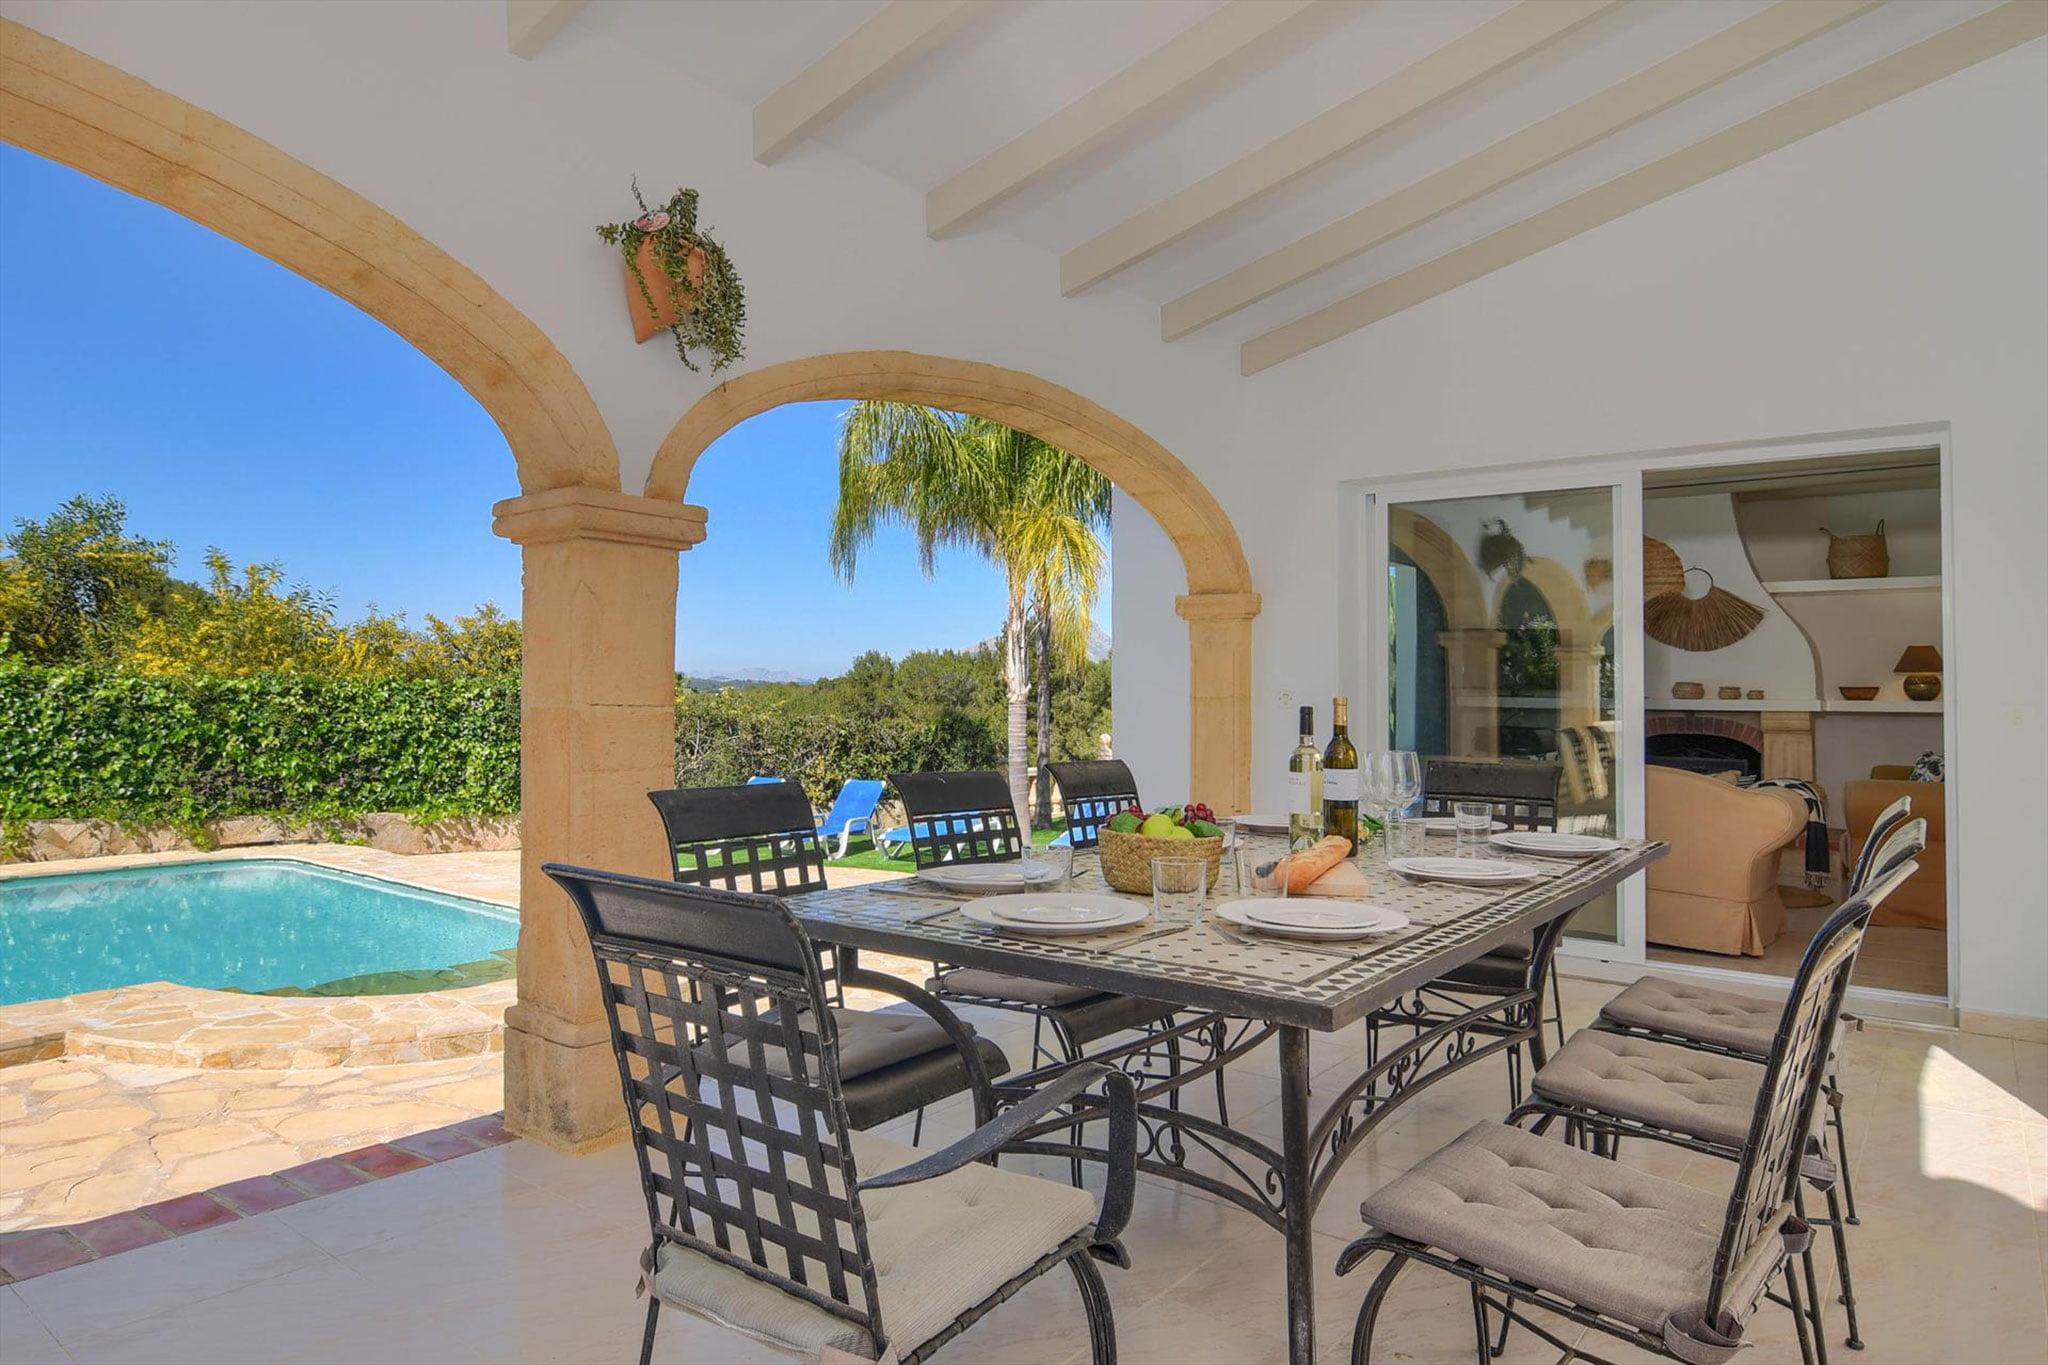 Terraza de una casa de alquiler para vacaciones en Jávea – Aguila Rent a Villa